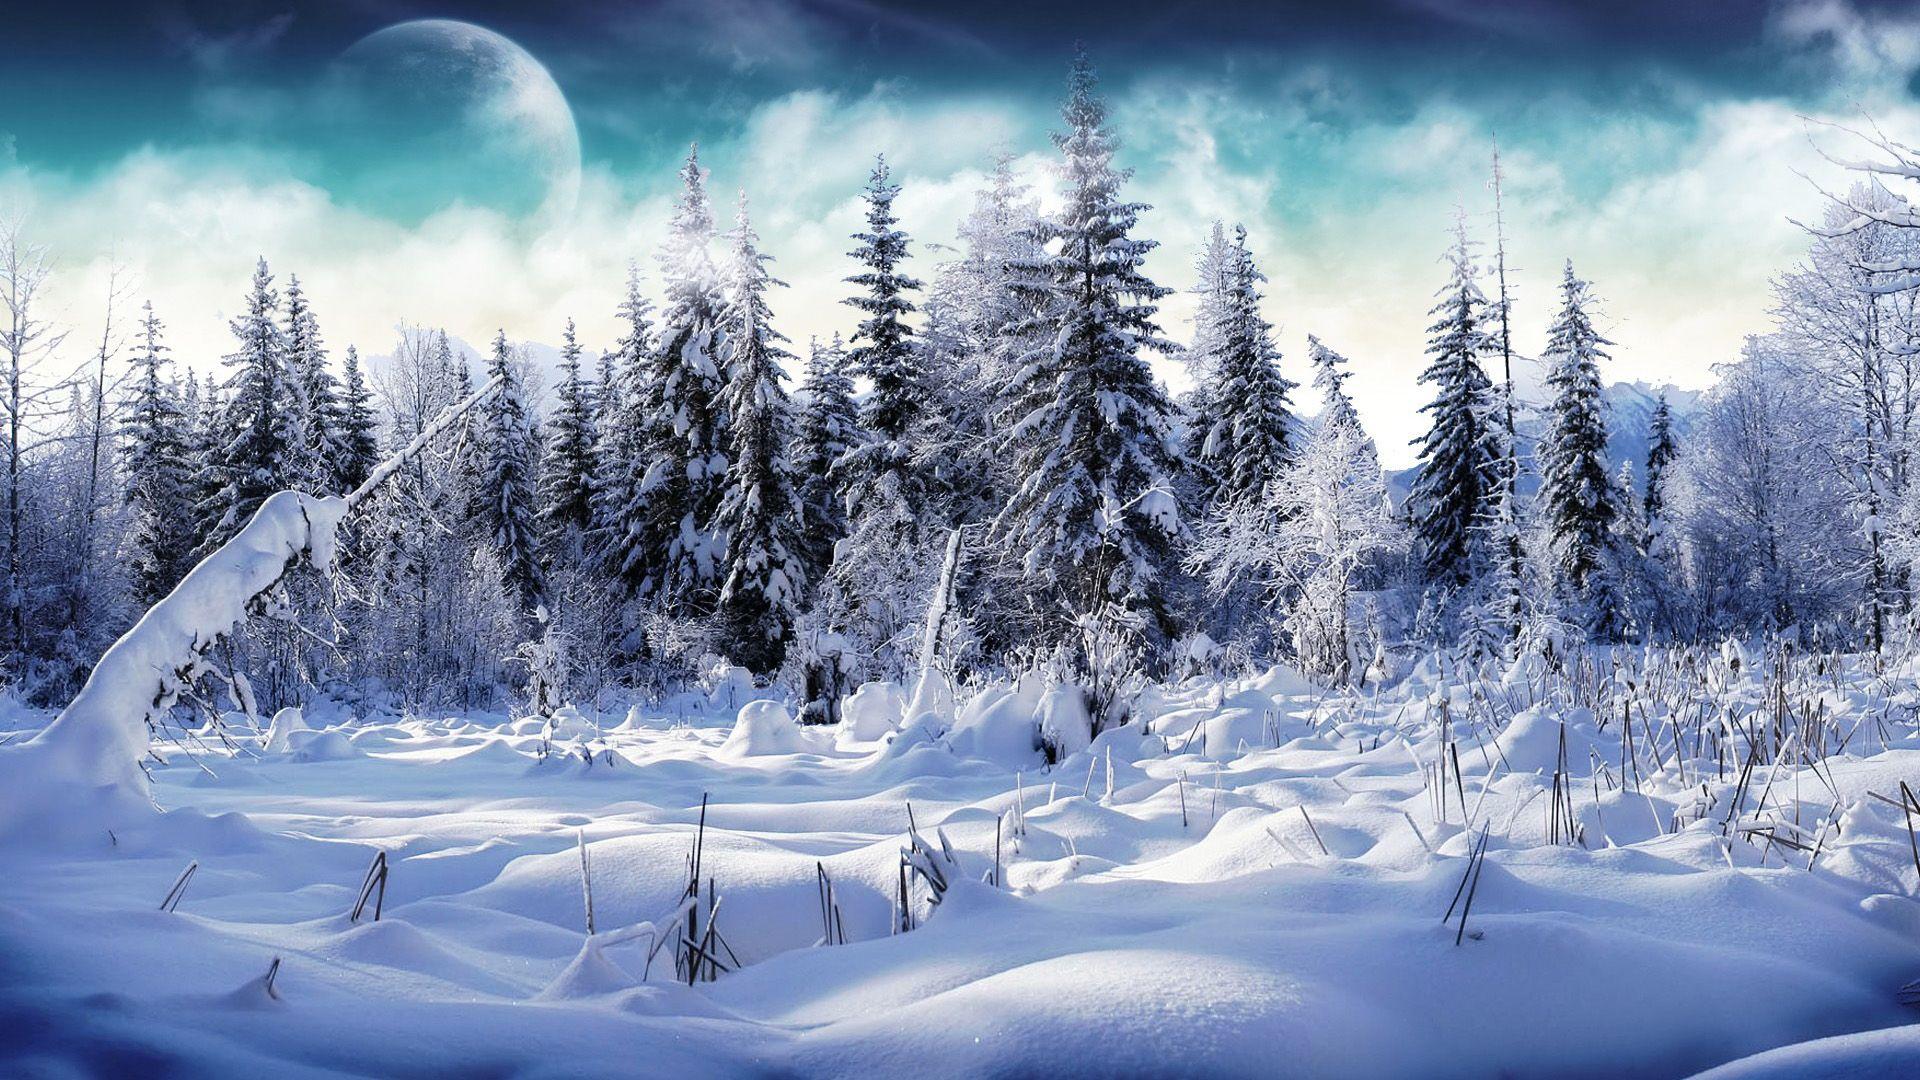 14 paisajes nevados bellos navidad nieve fondos - Paisaje nevado navidad ...